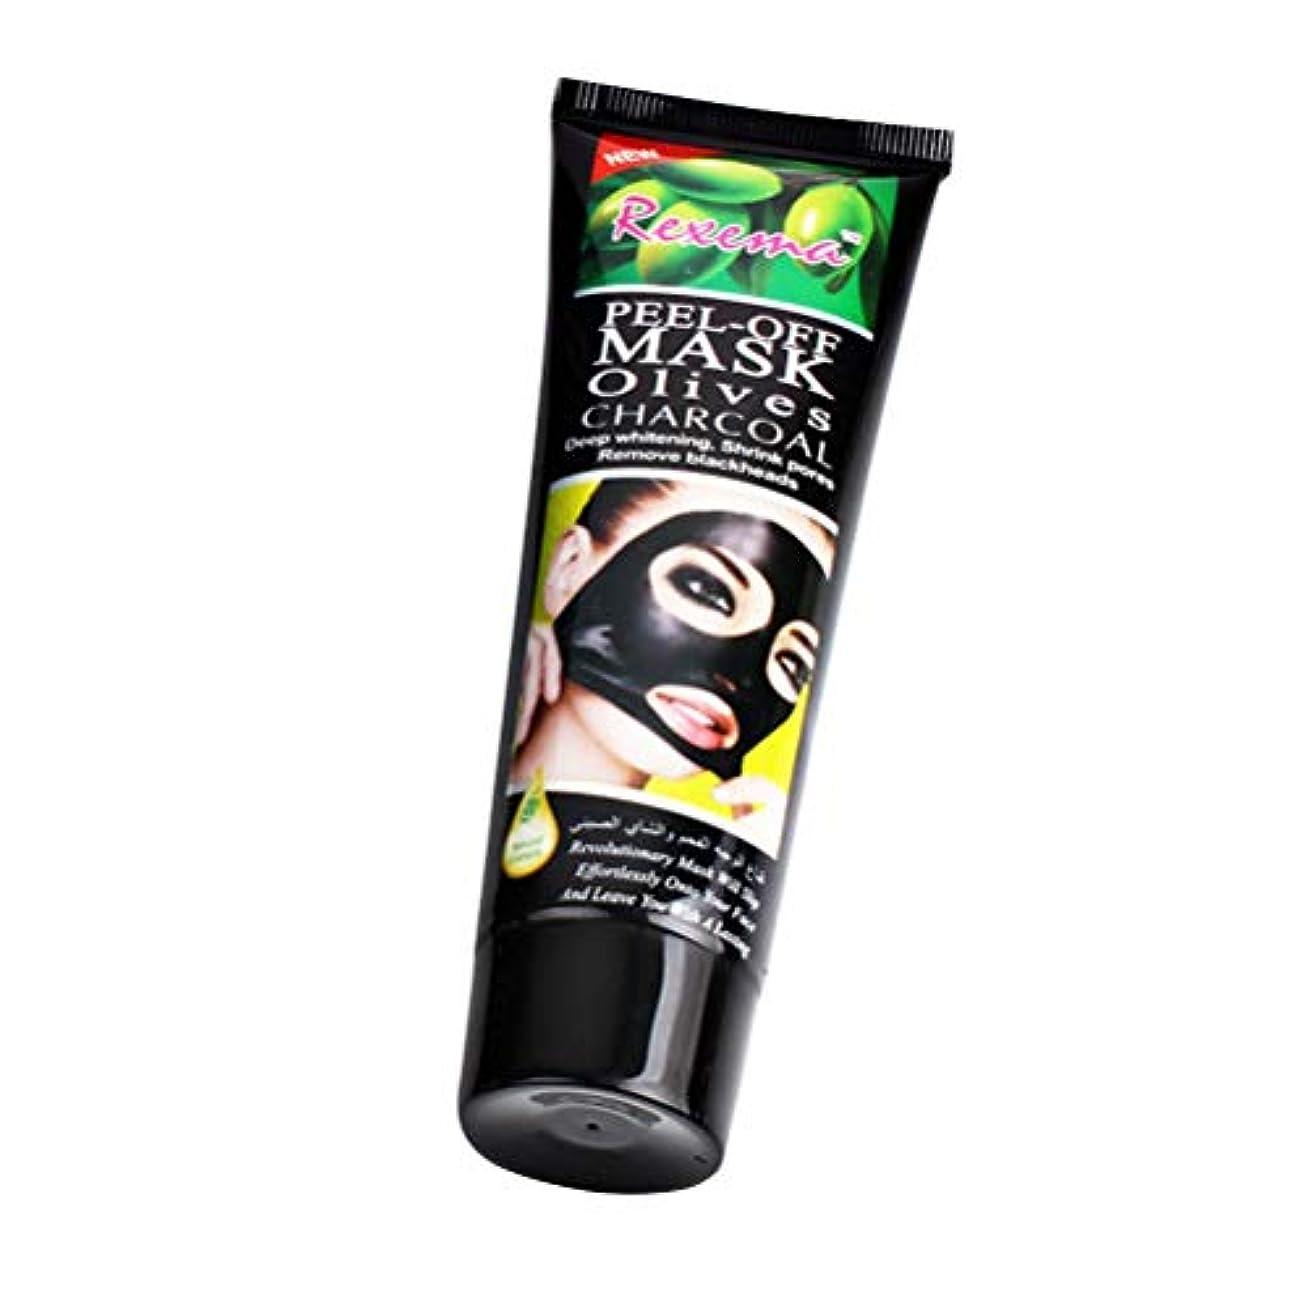 Healifty スキンケア保湿フェイスマスクを引き締める美容フェイスマスクナチュラルオリーブ栄養フェイシャルマスク